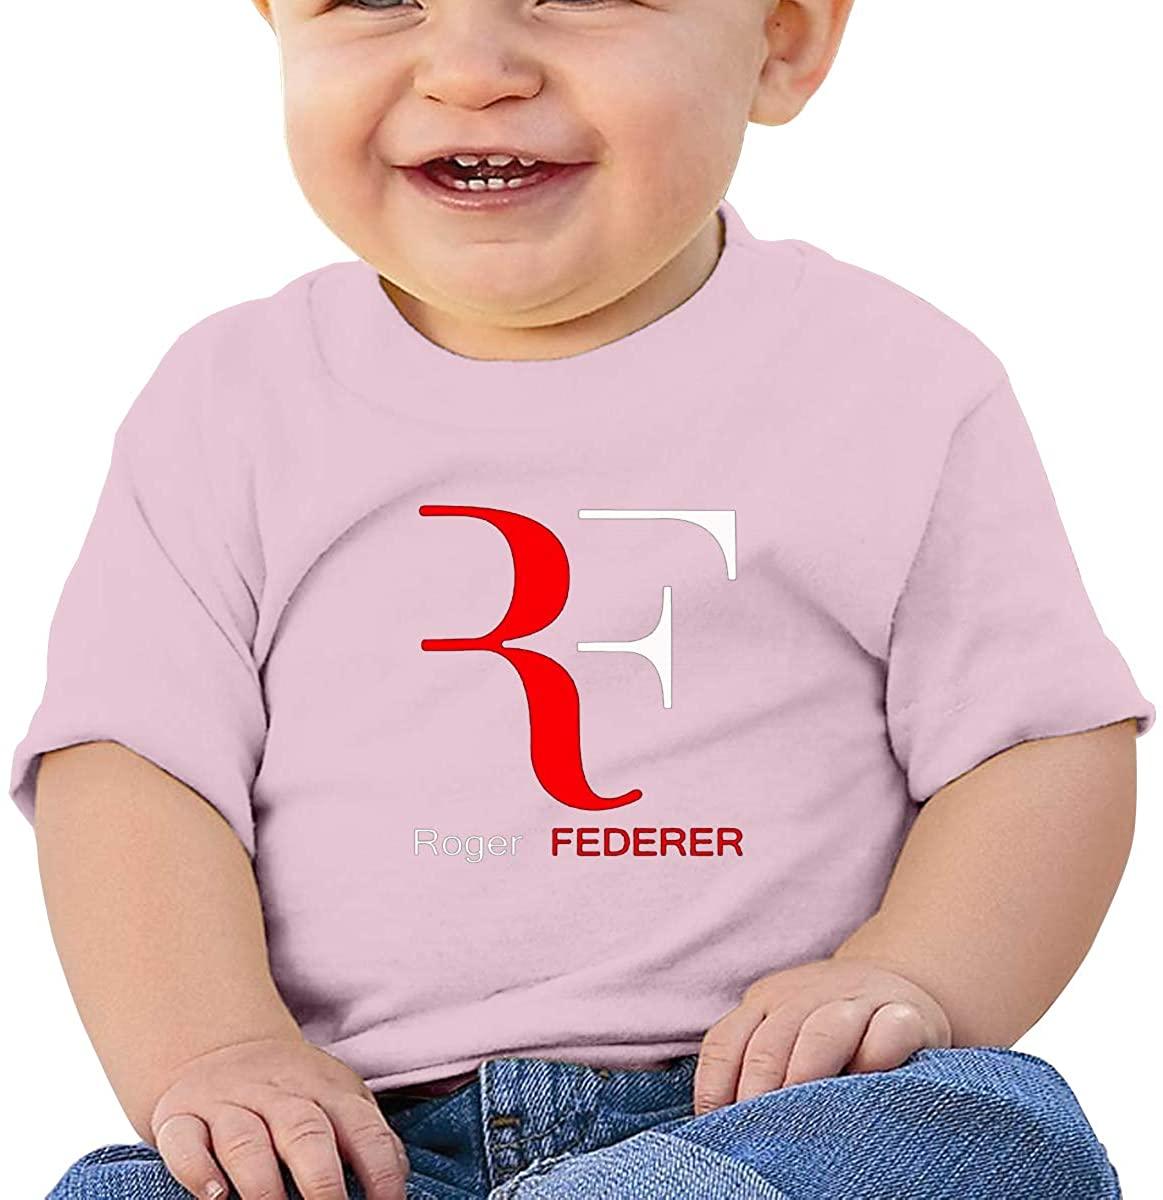 6-24 Months Boy and Girl Baby Short Sleeve T-Shirt Roger Federer Elegant and Simple Design Pink